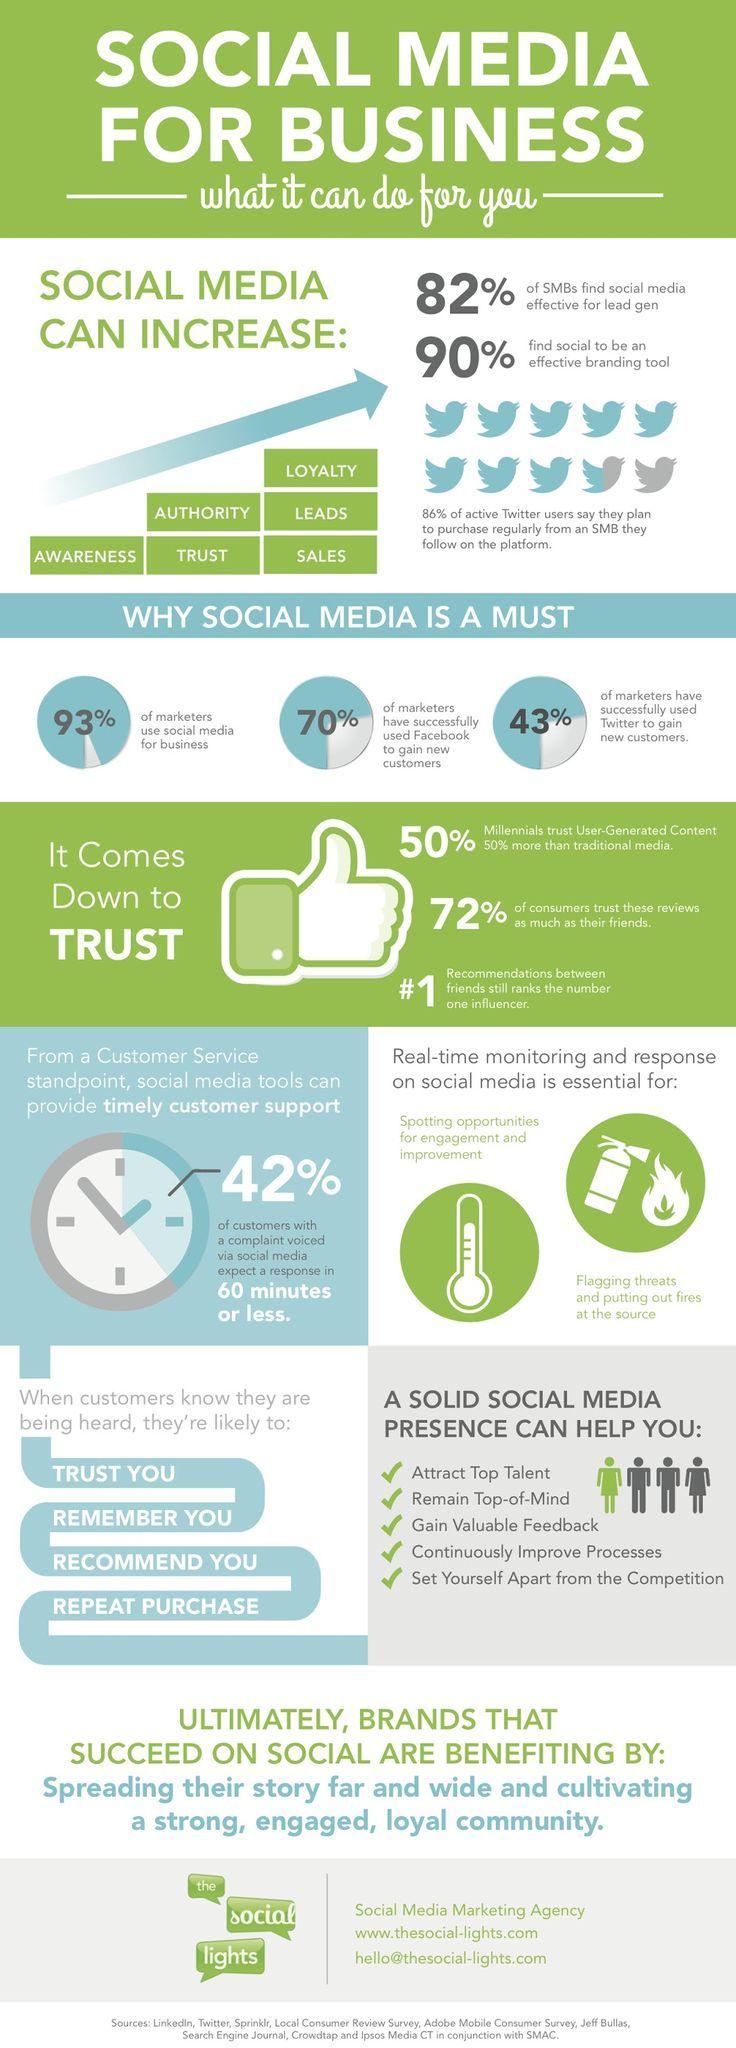 Social Media Benefits for Business